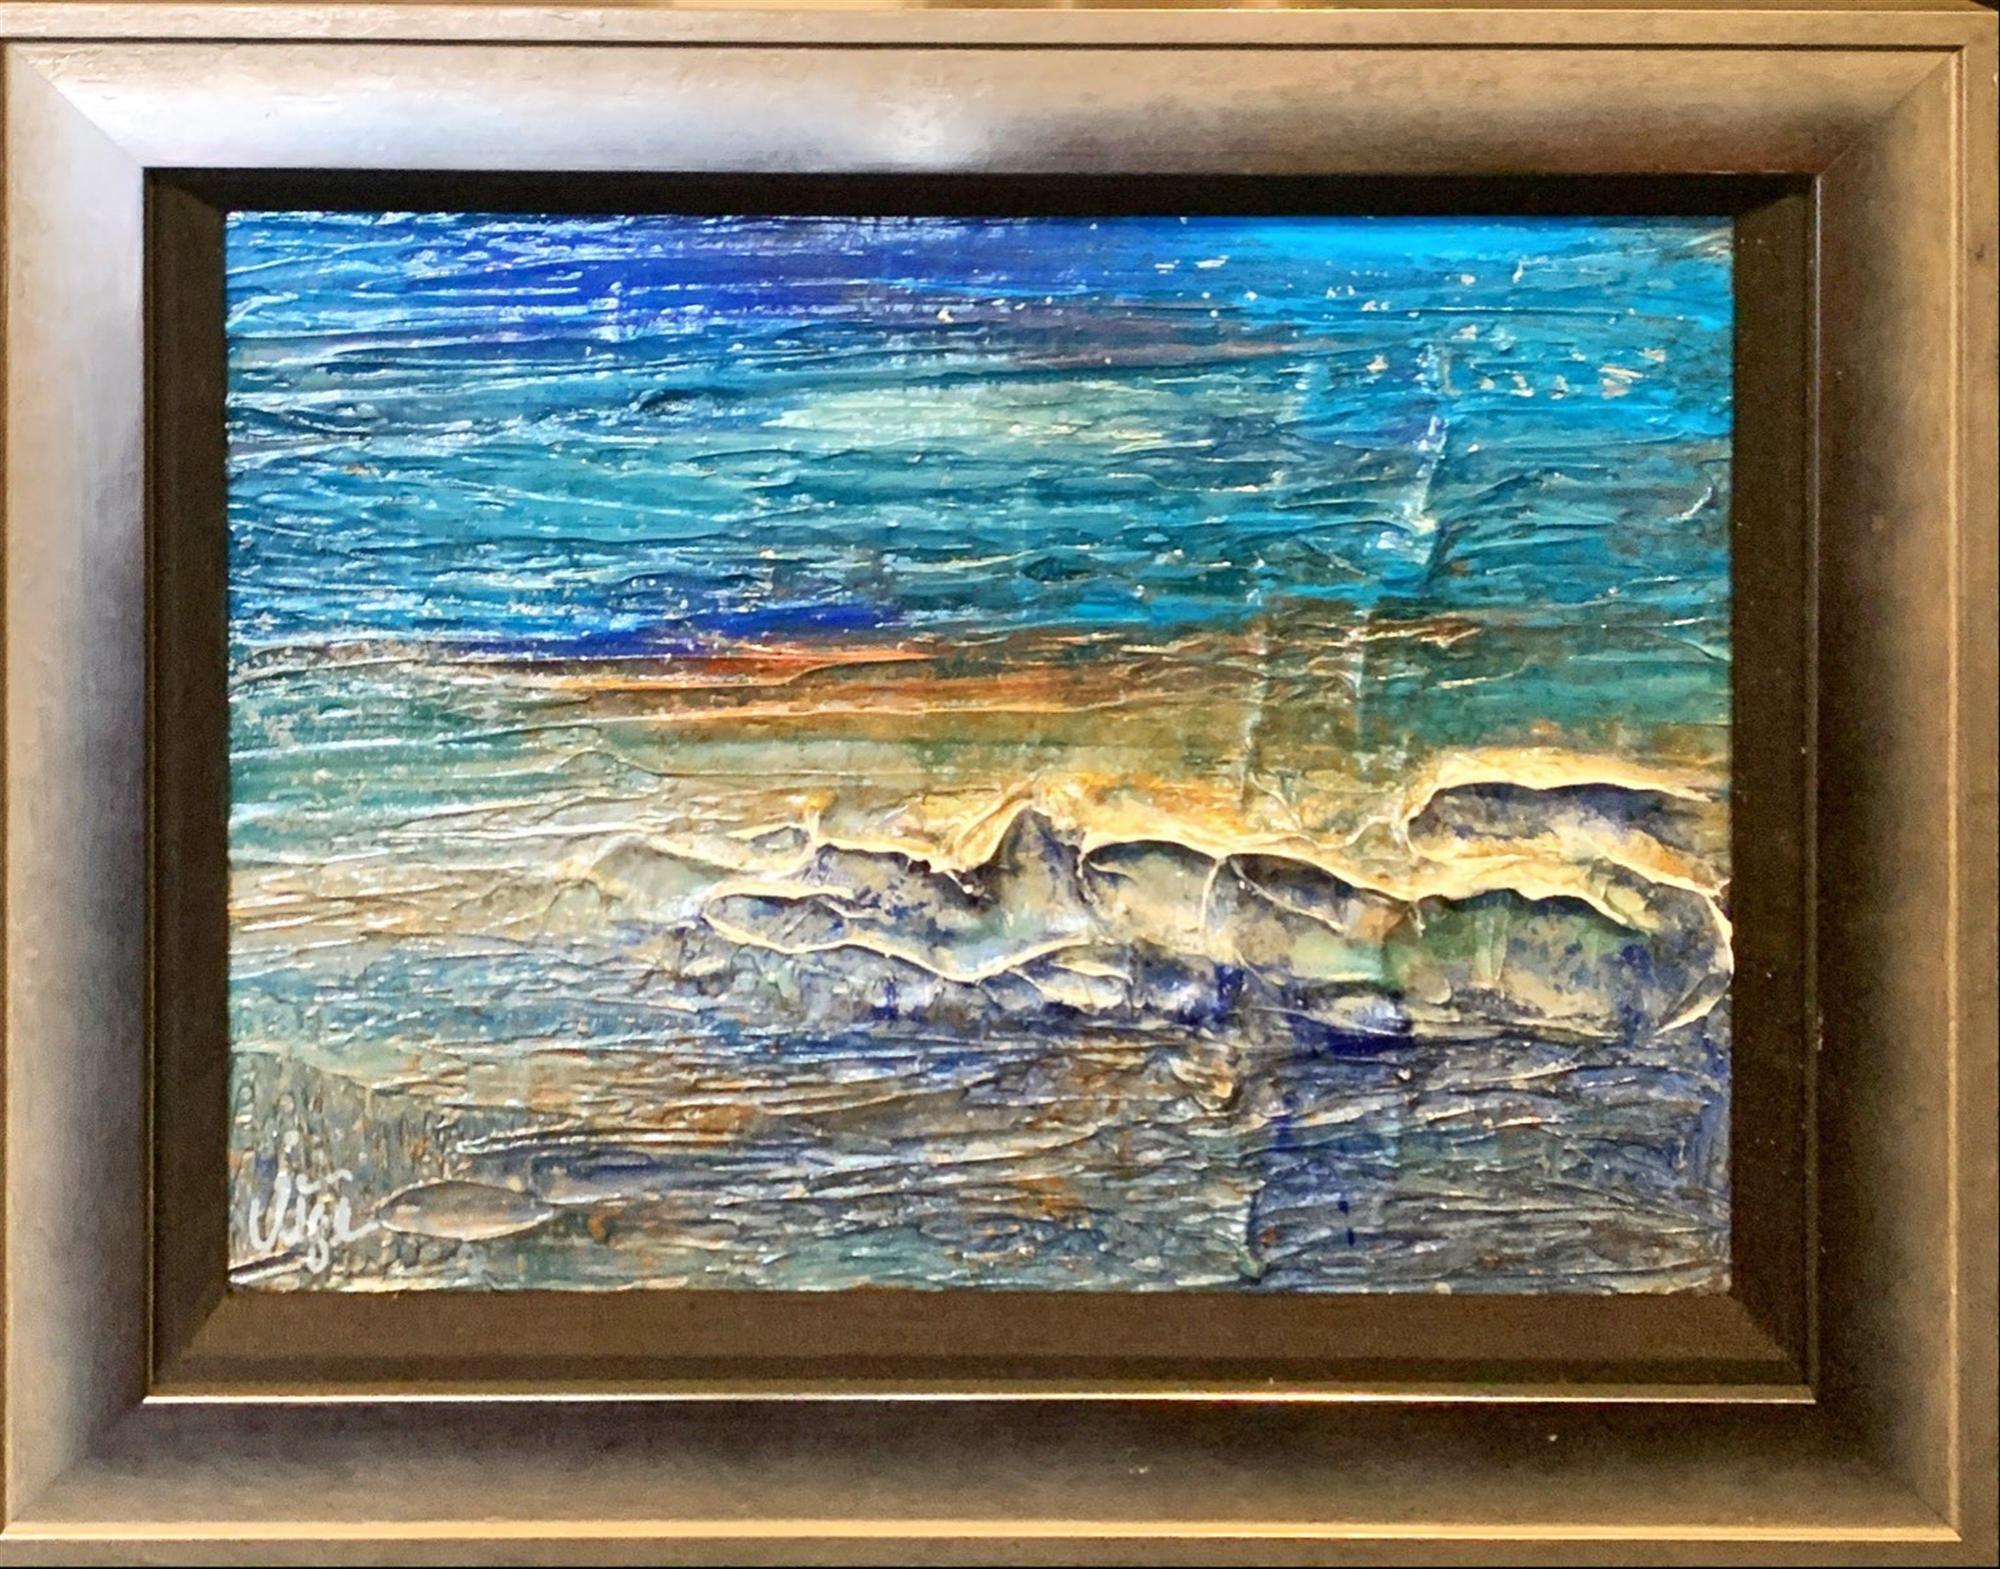 Seas the Day II by Lisa Wilson